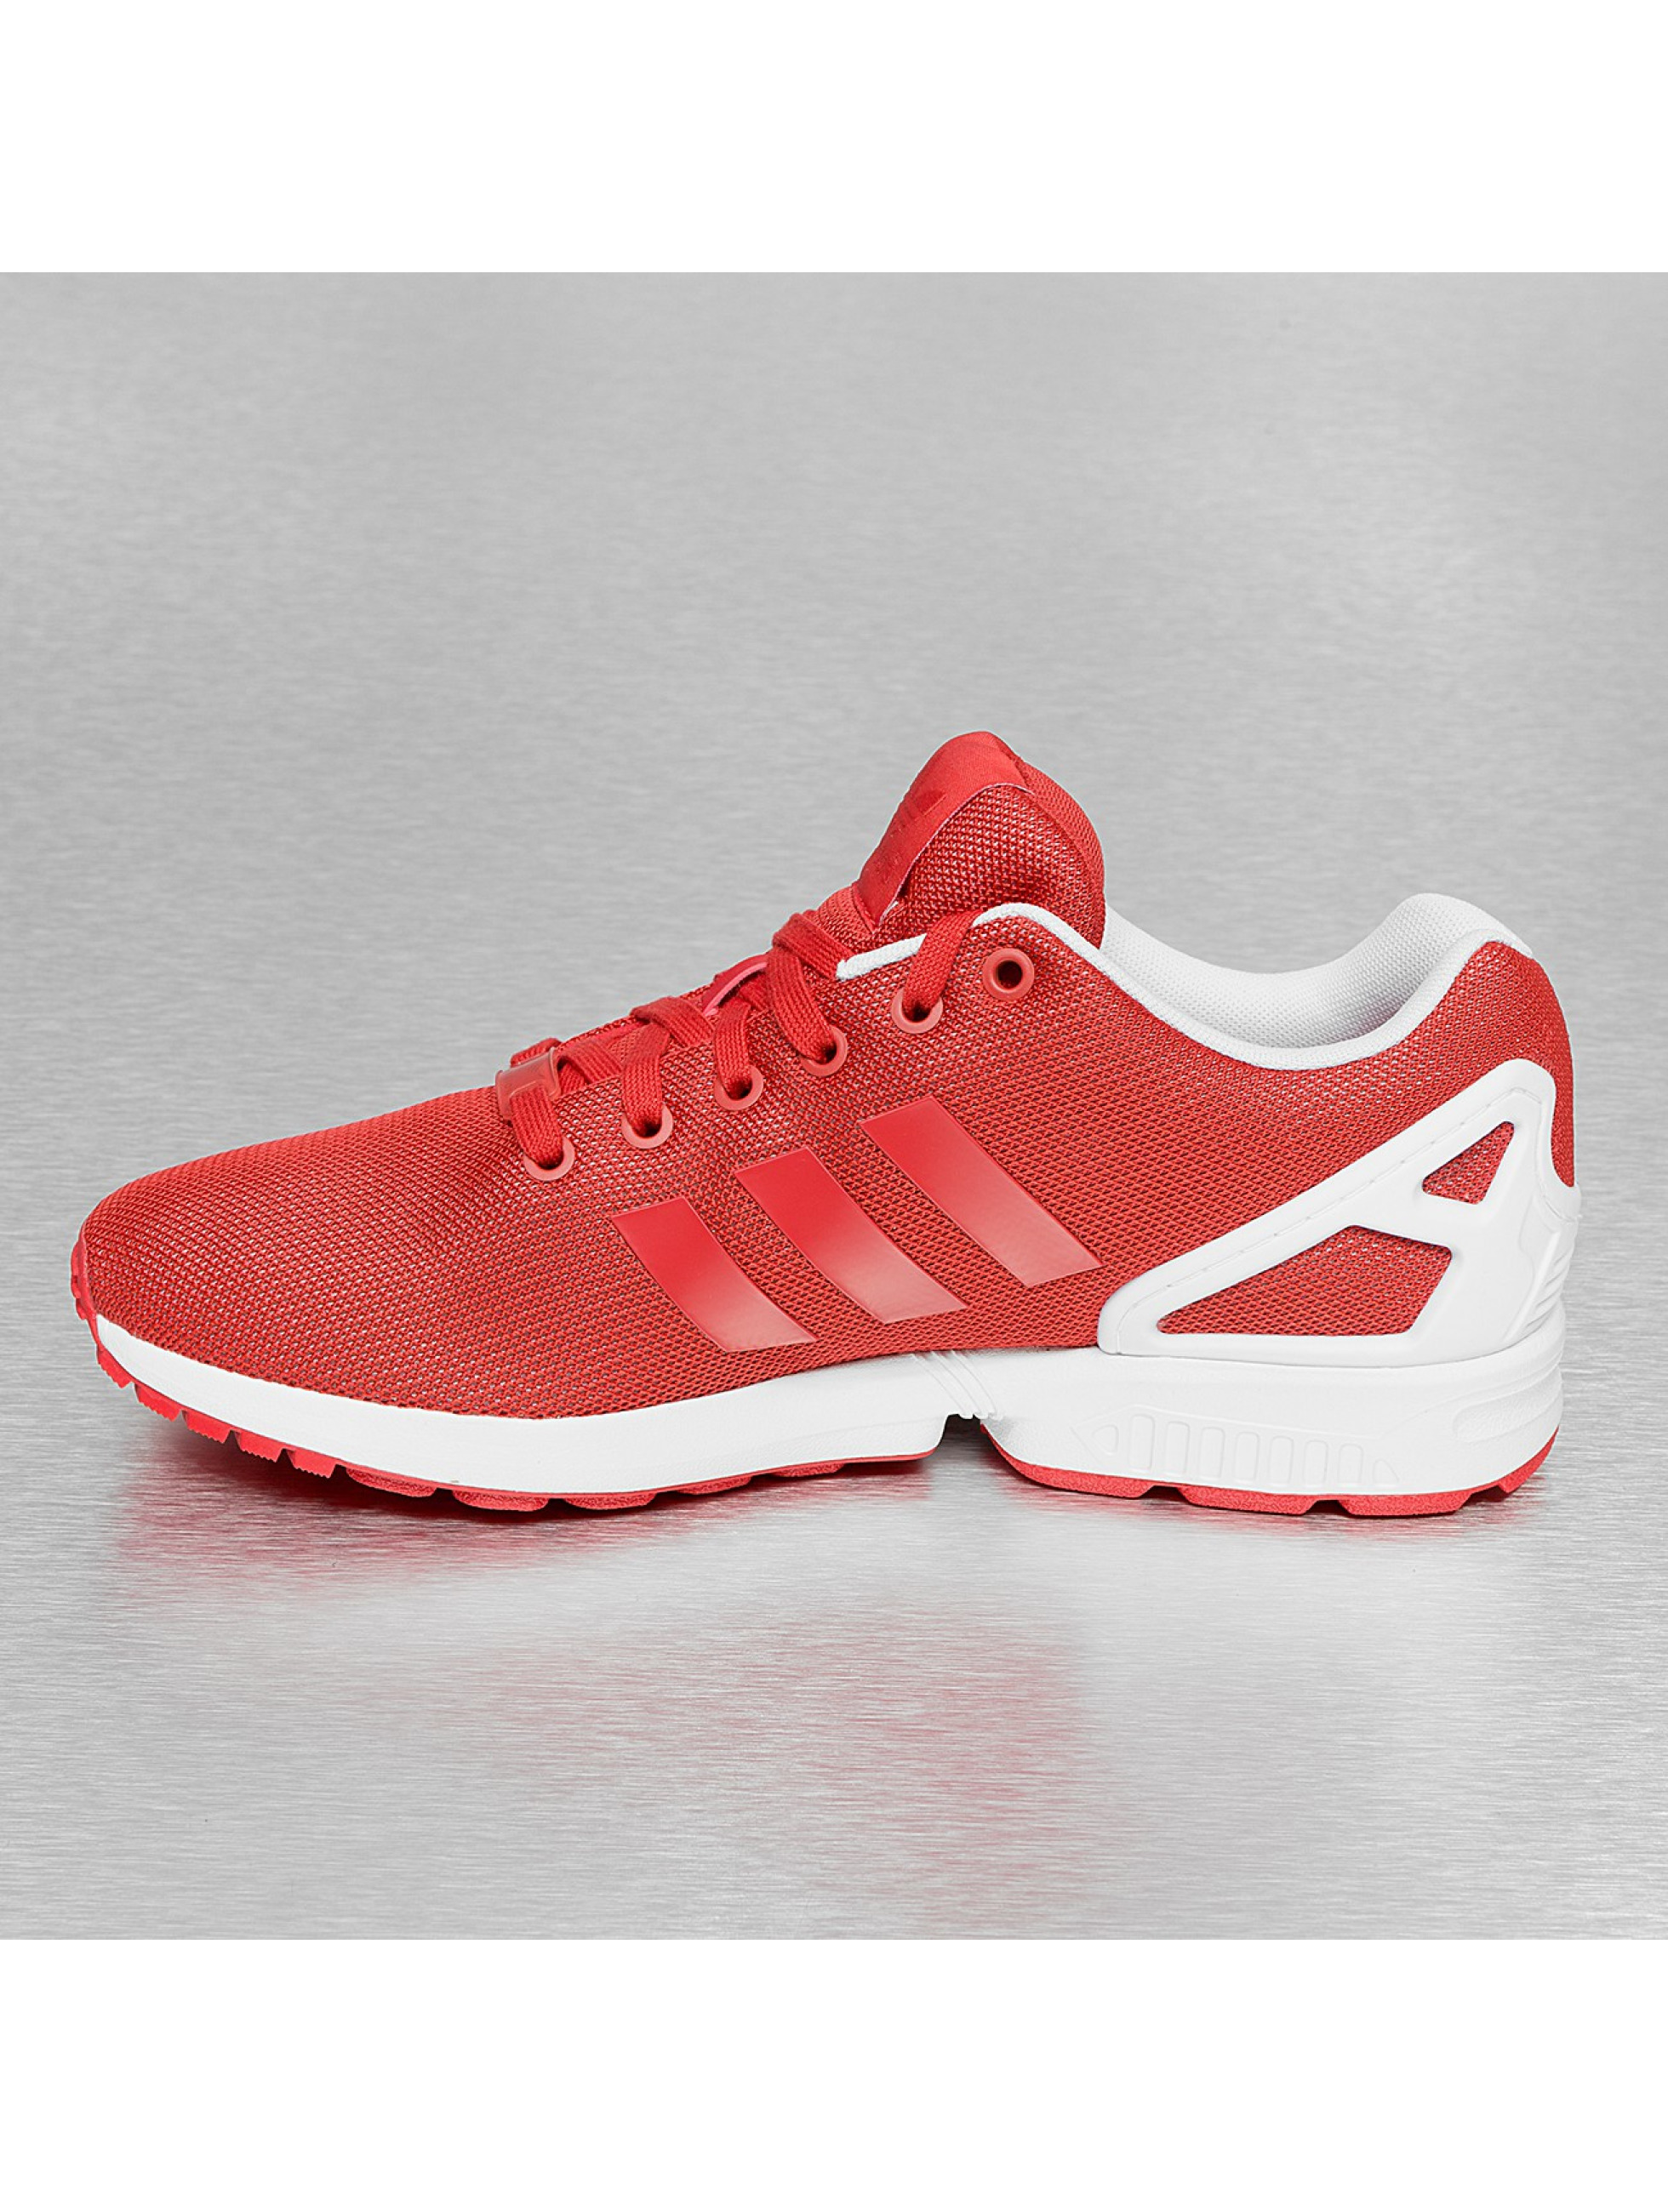 adidas zx flux rot weiß